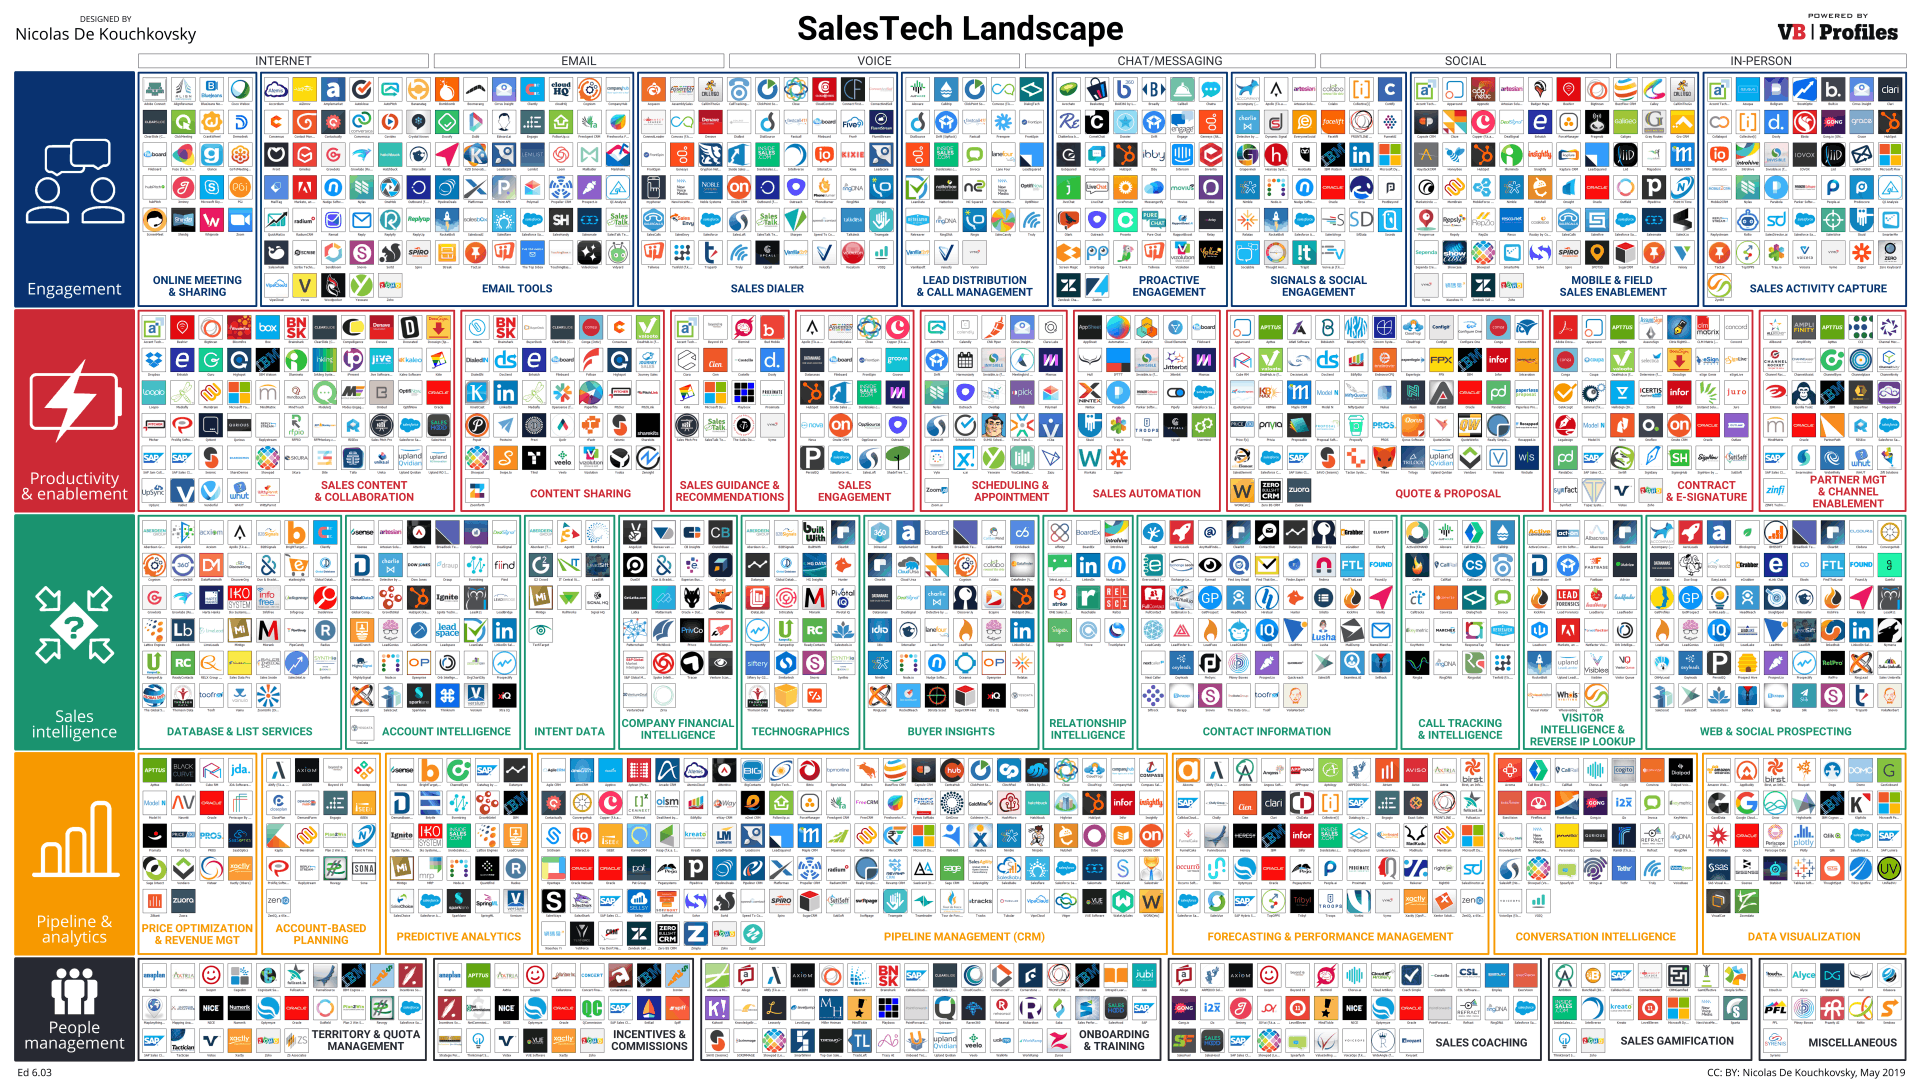 SalesTech landscape